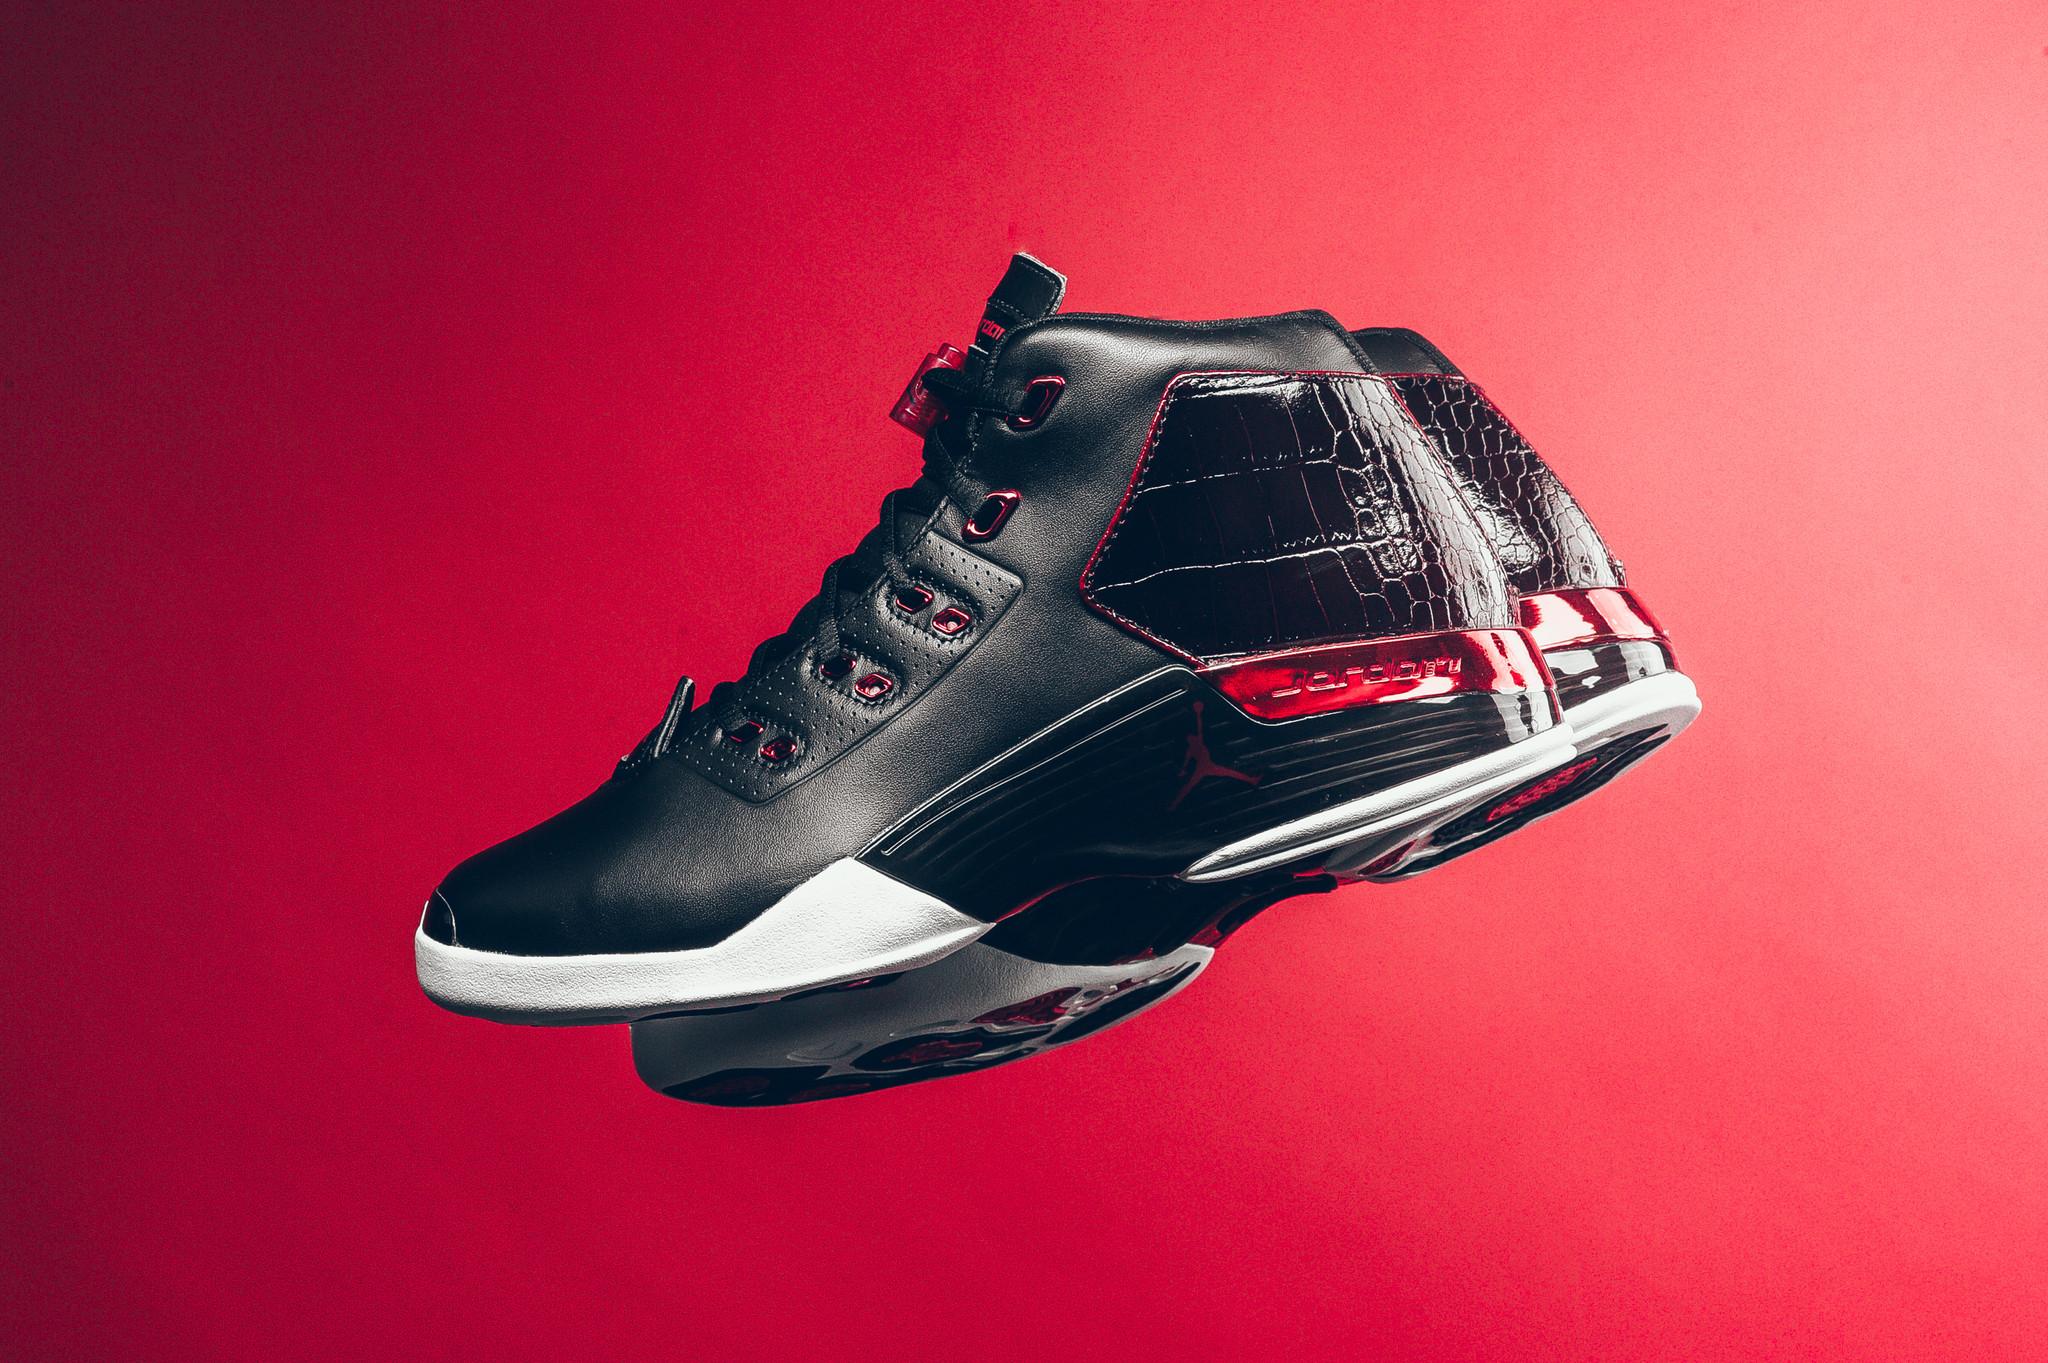 promo code bc958 1bb4c Air Jordan 17 Archives - Air Jordans, Release Dates   More   JordansDaily .com